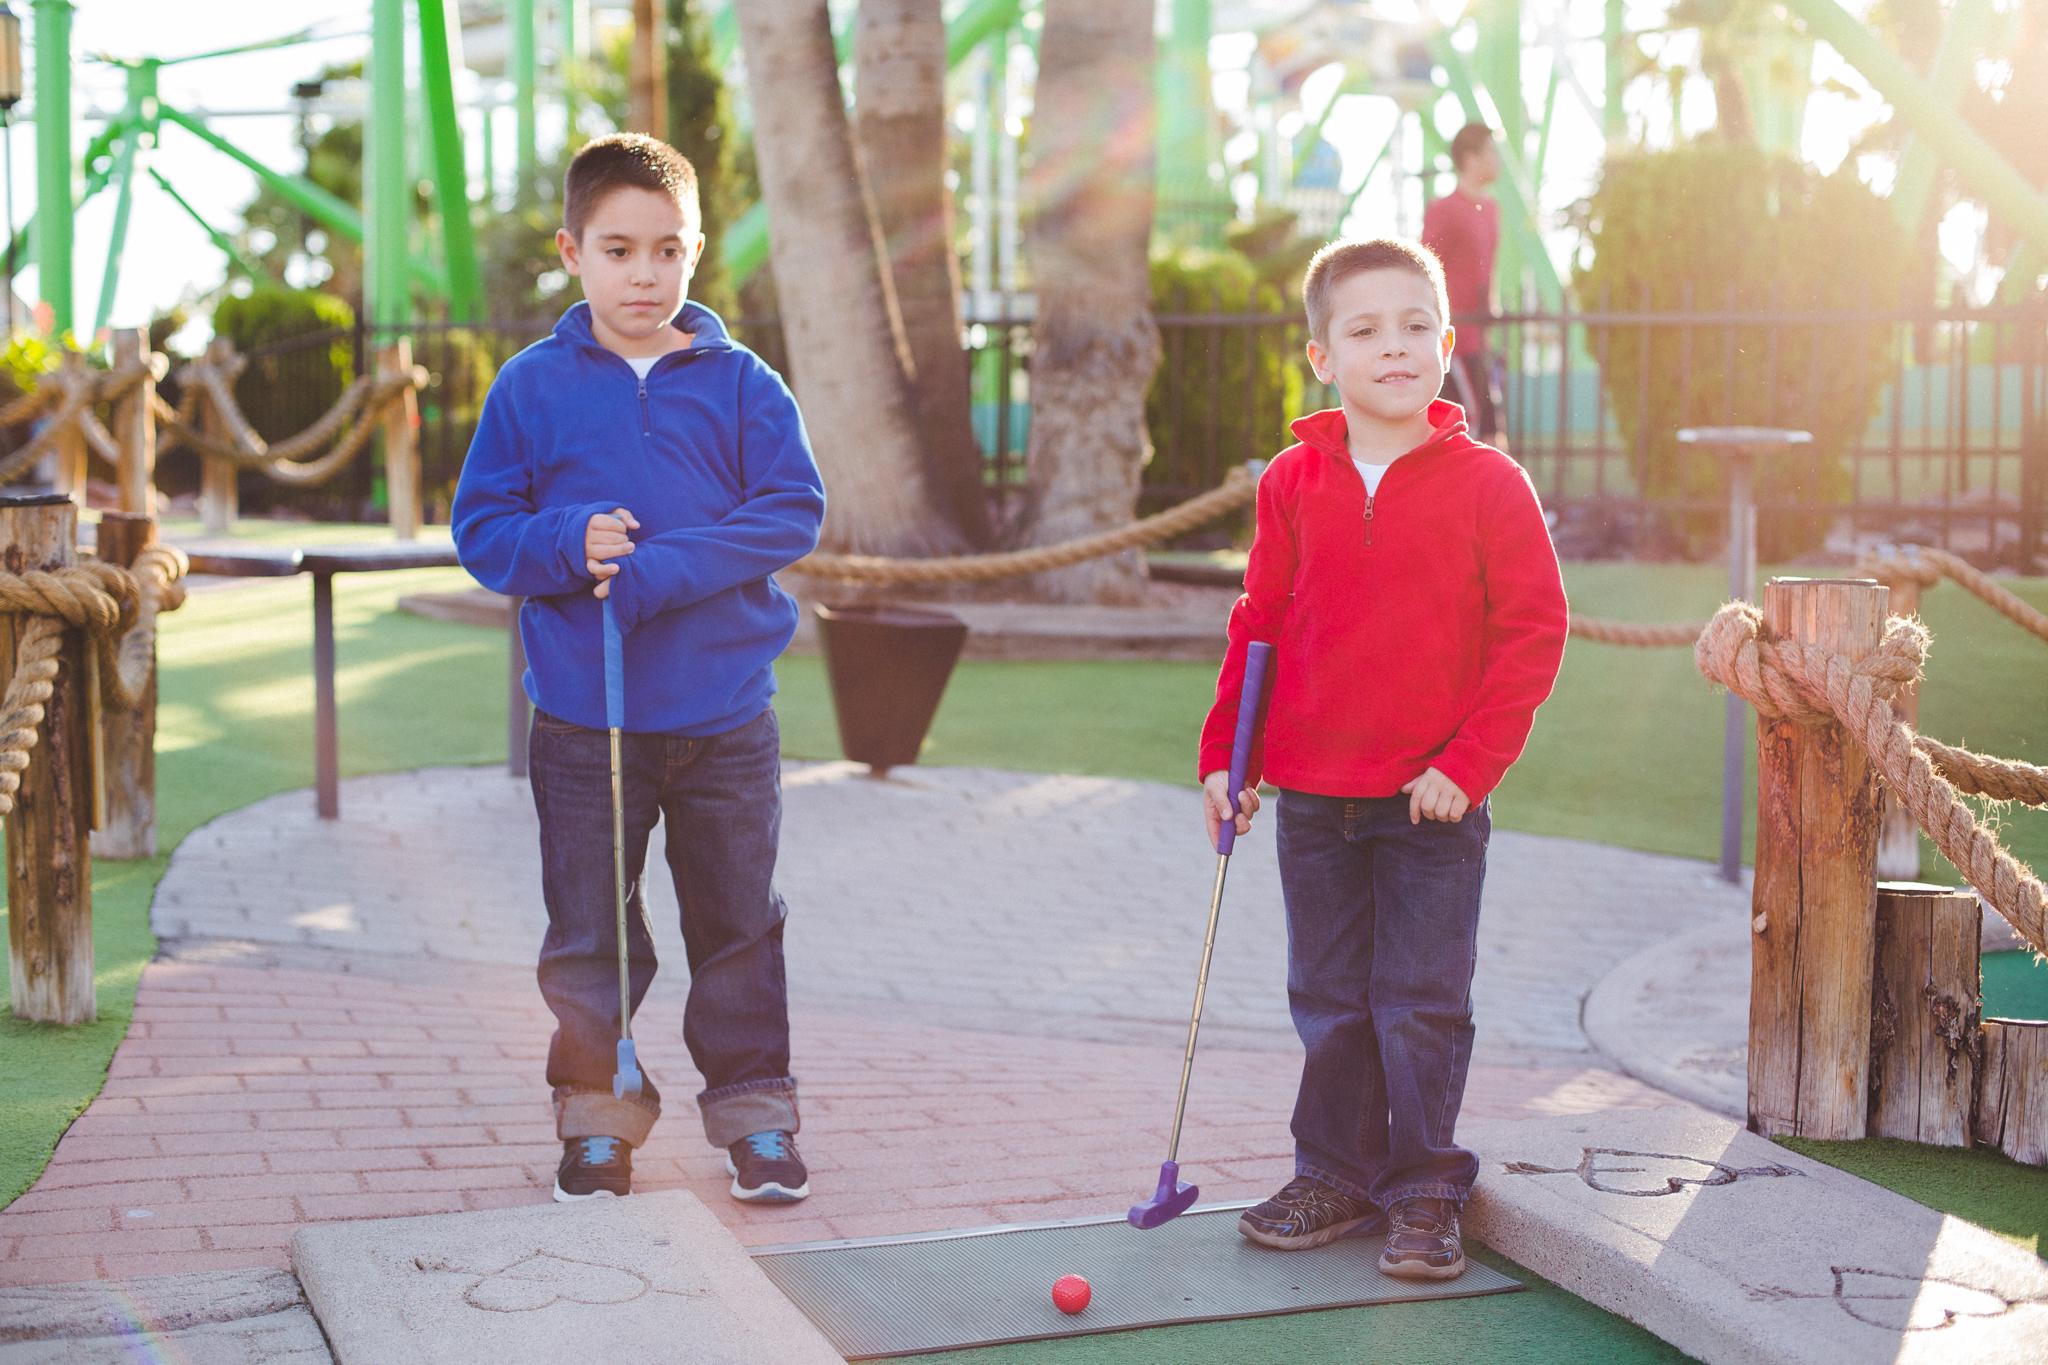 the boys prepare to start mini golf